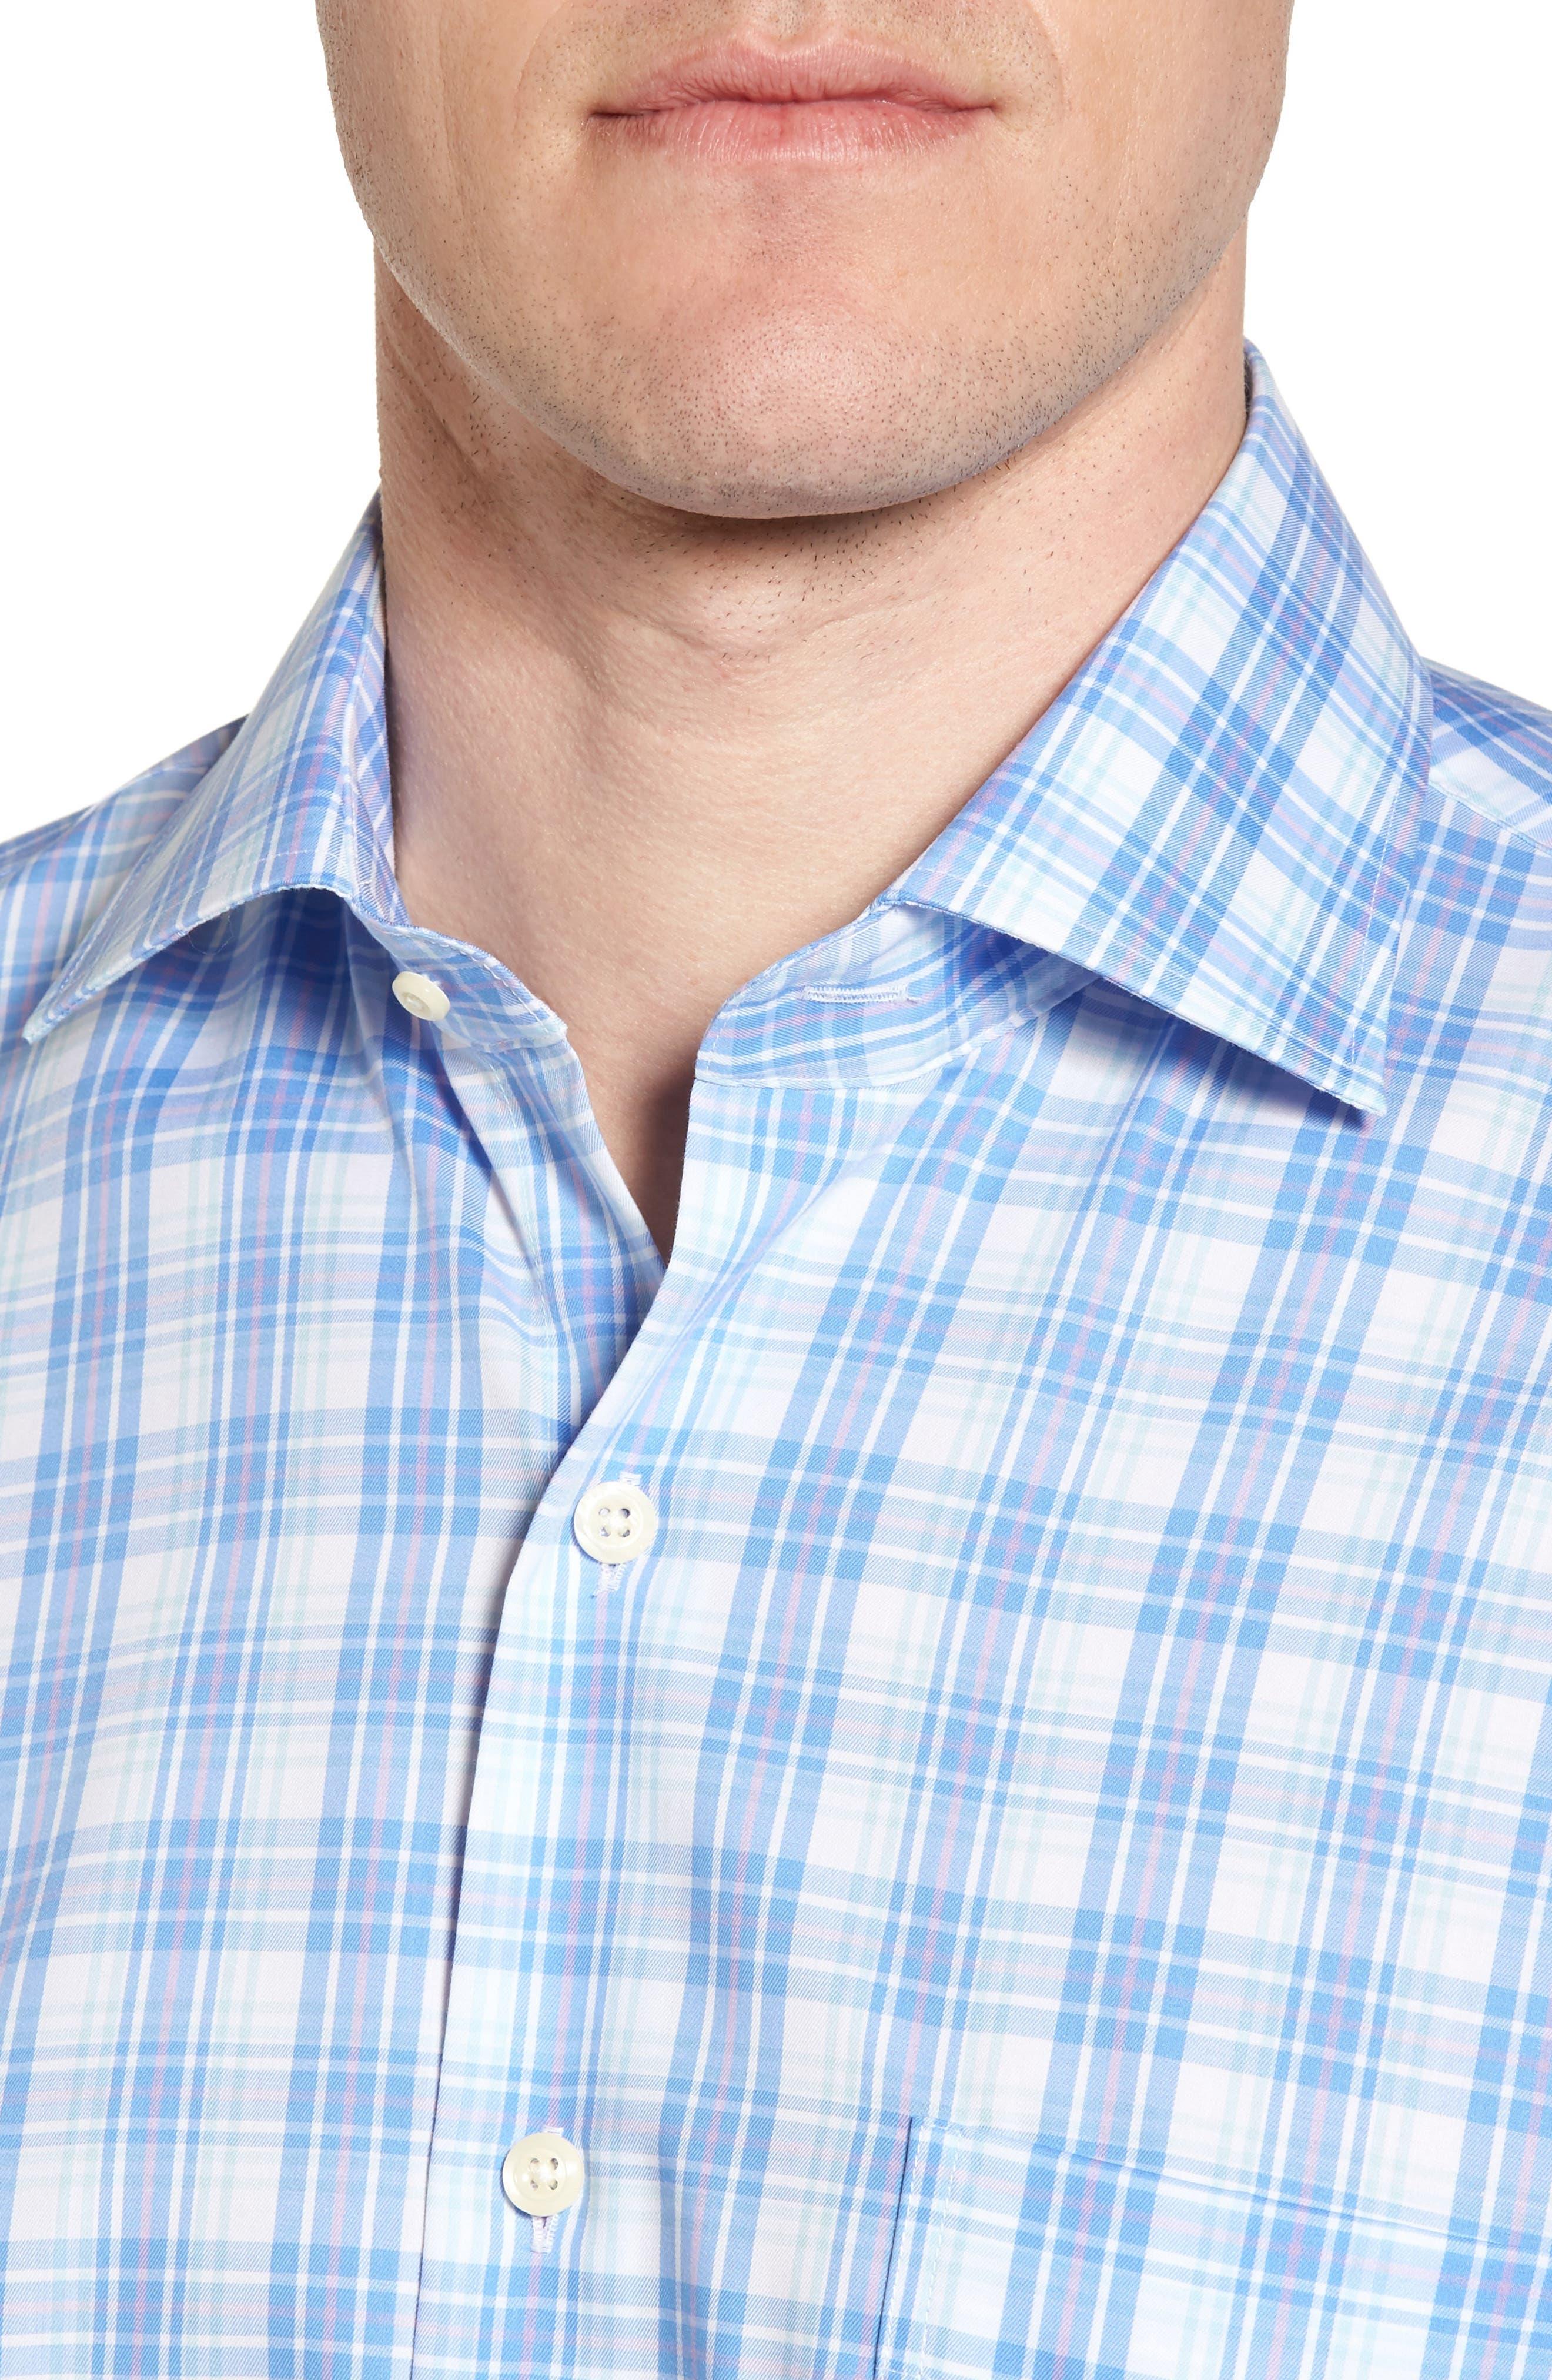 Crown Ease Sloan Regular Fit Plaid Sport Shirt,                             Alternate thumbnail 4, color,                             ATLAS BLUE